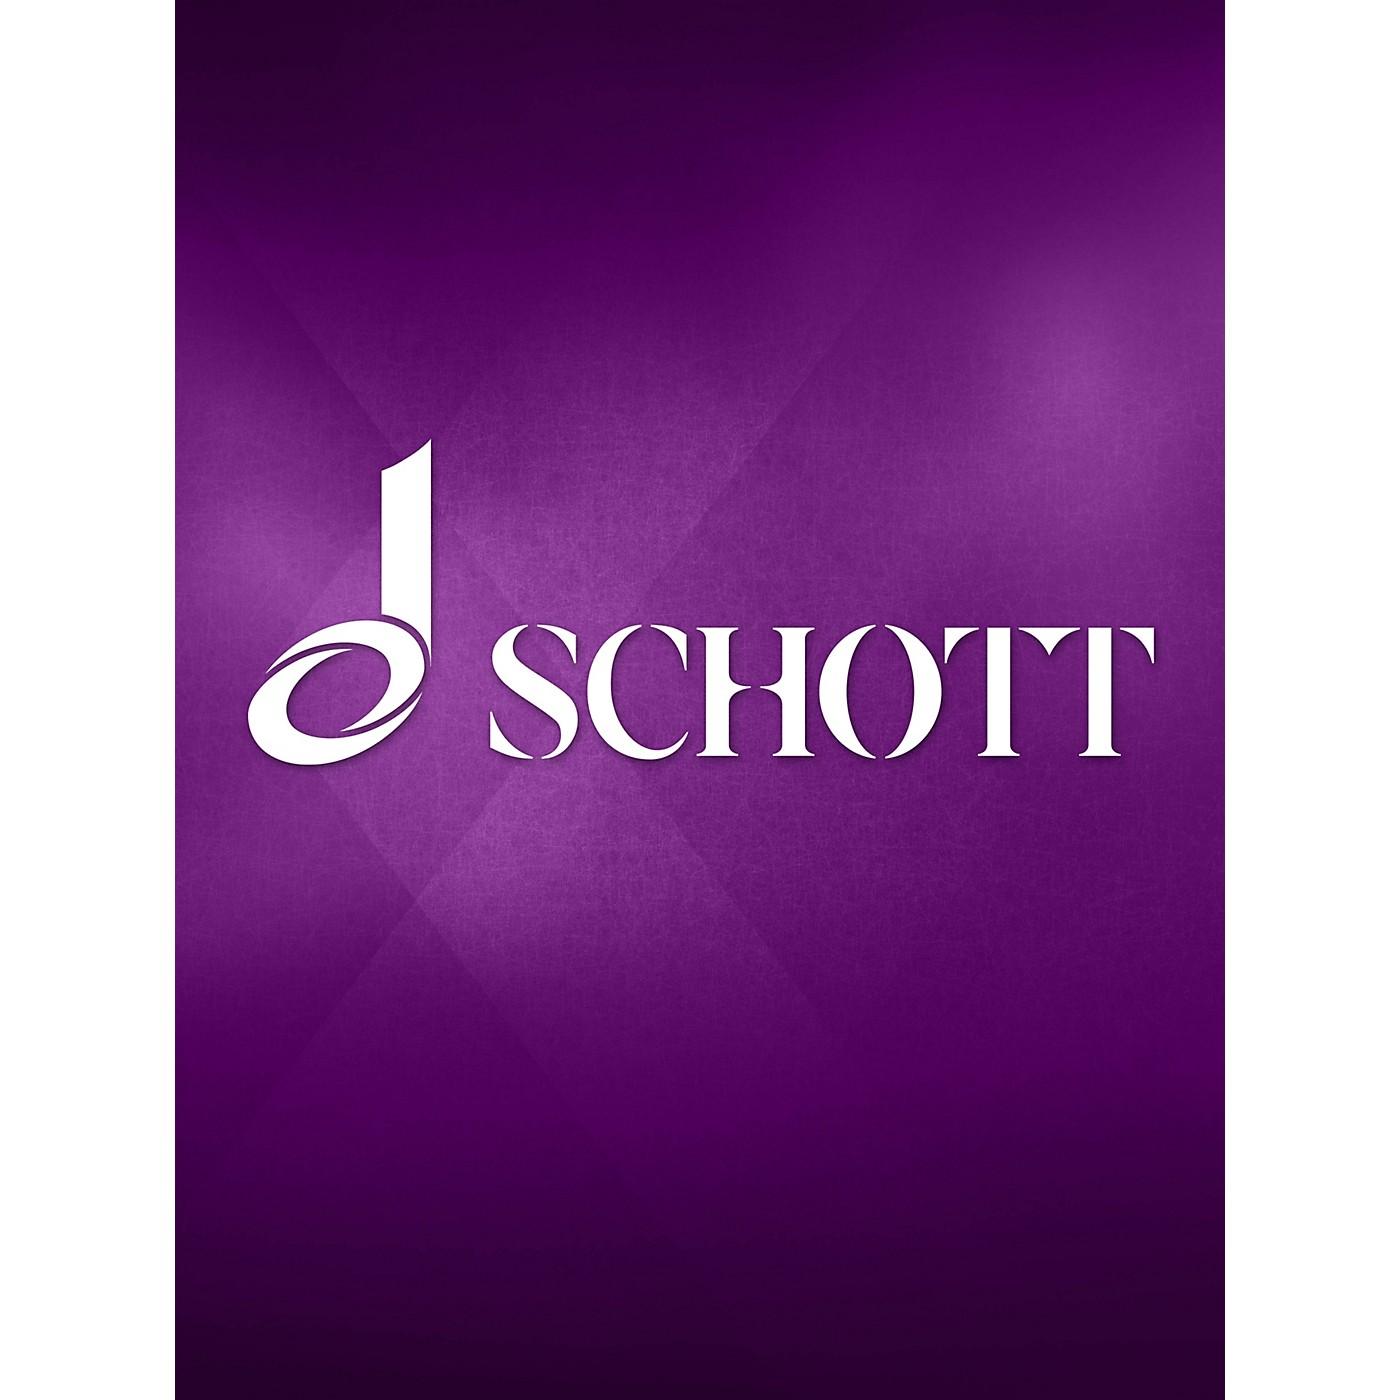 Schott Music String Quartet No. 4 (with Obbligato Clarinet - Score and Parts) Schott Series by Volker David Kirchner thumbnail